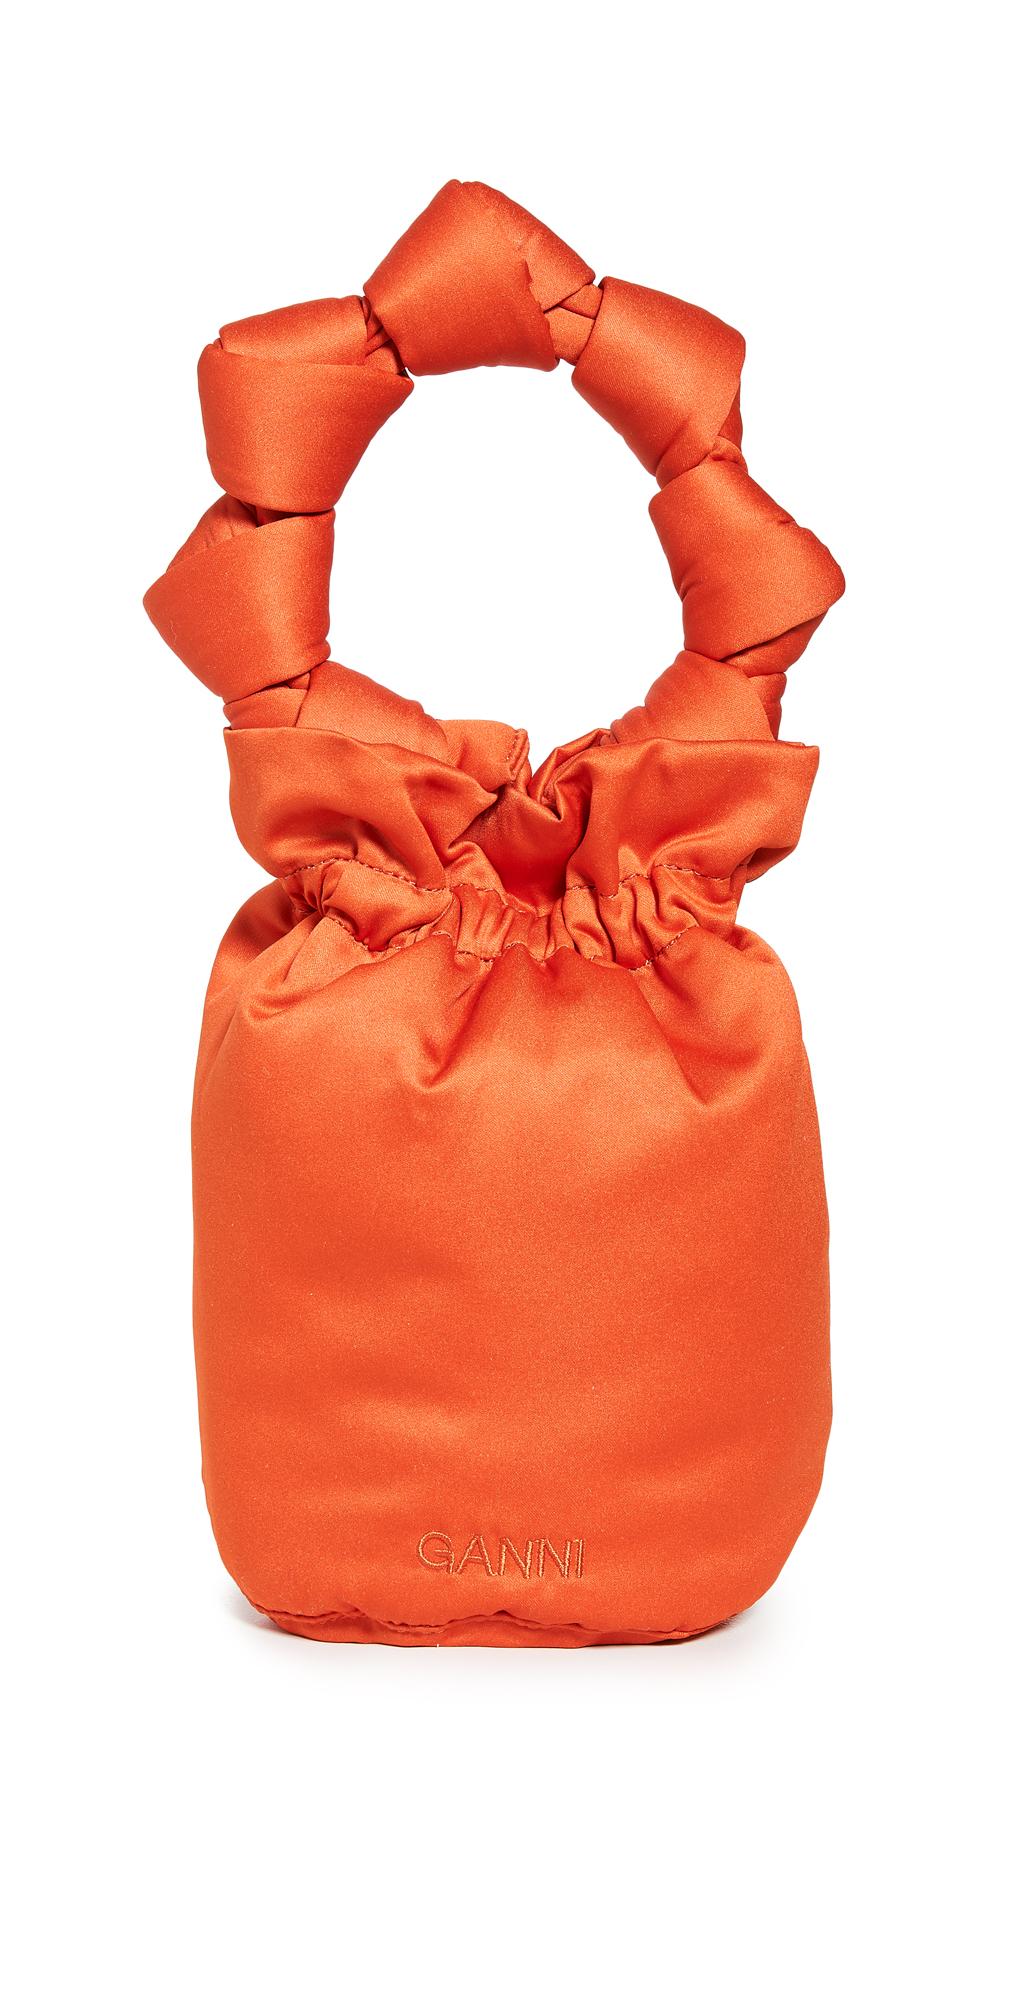 GANNI Satin Knot Bucket Bag